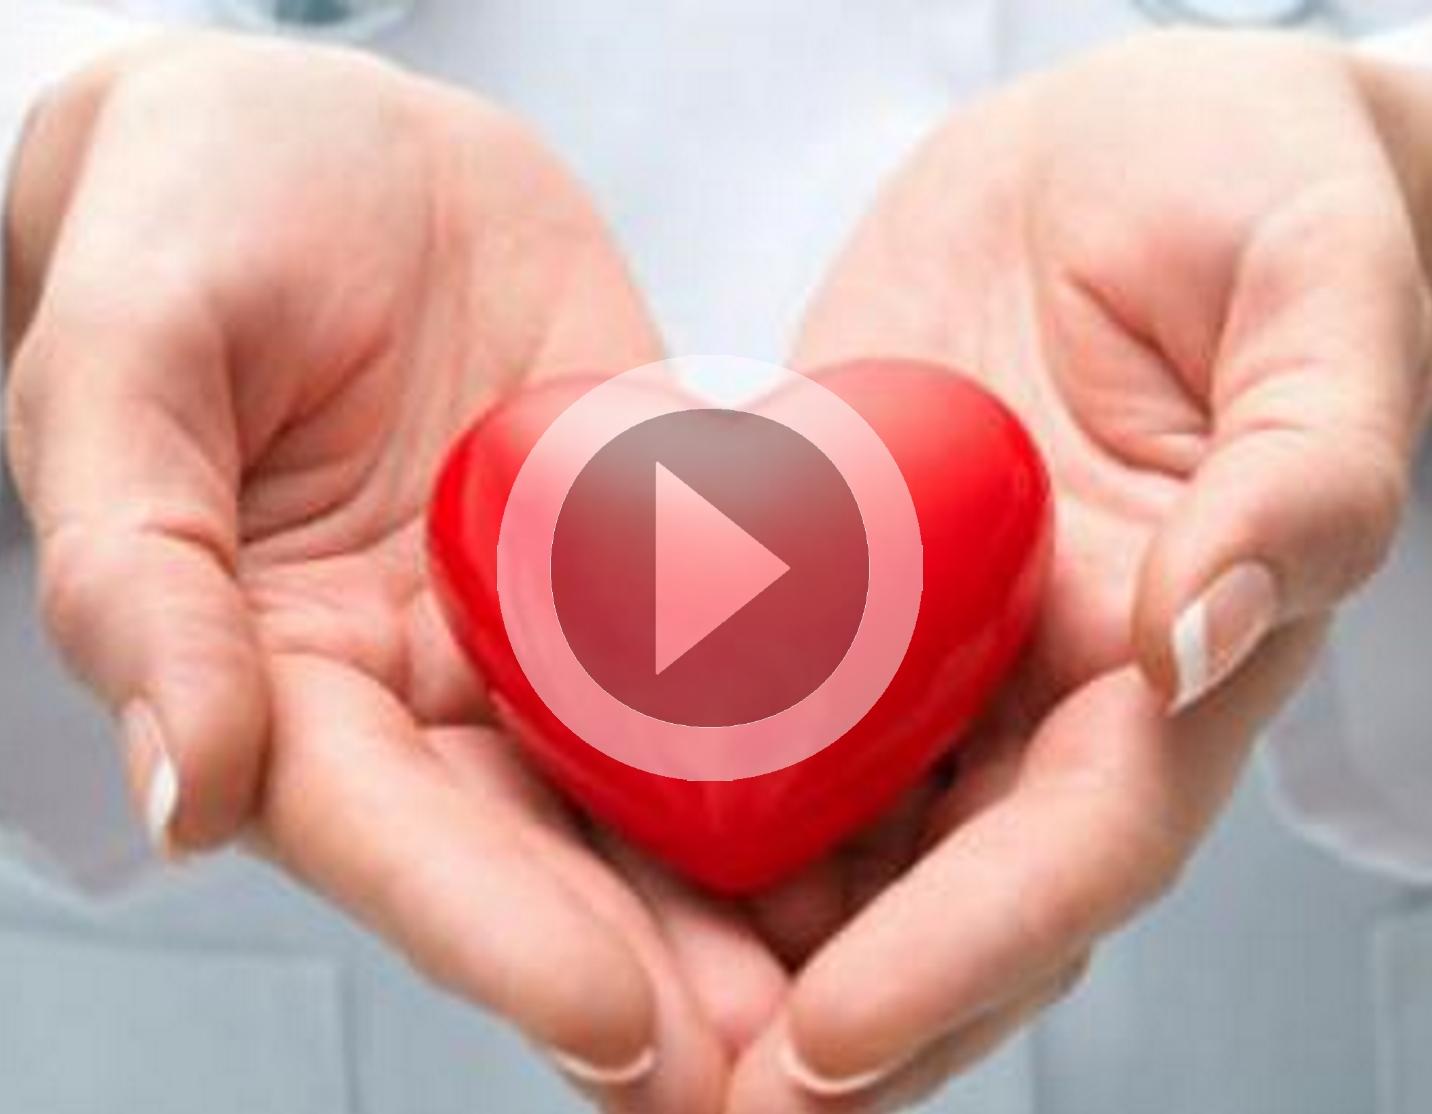 gerer linfarctus en cardiologie interventionnelle